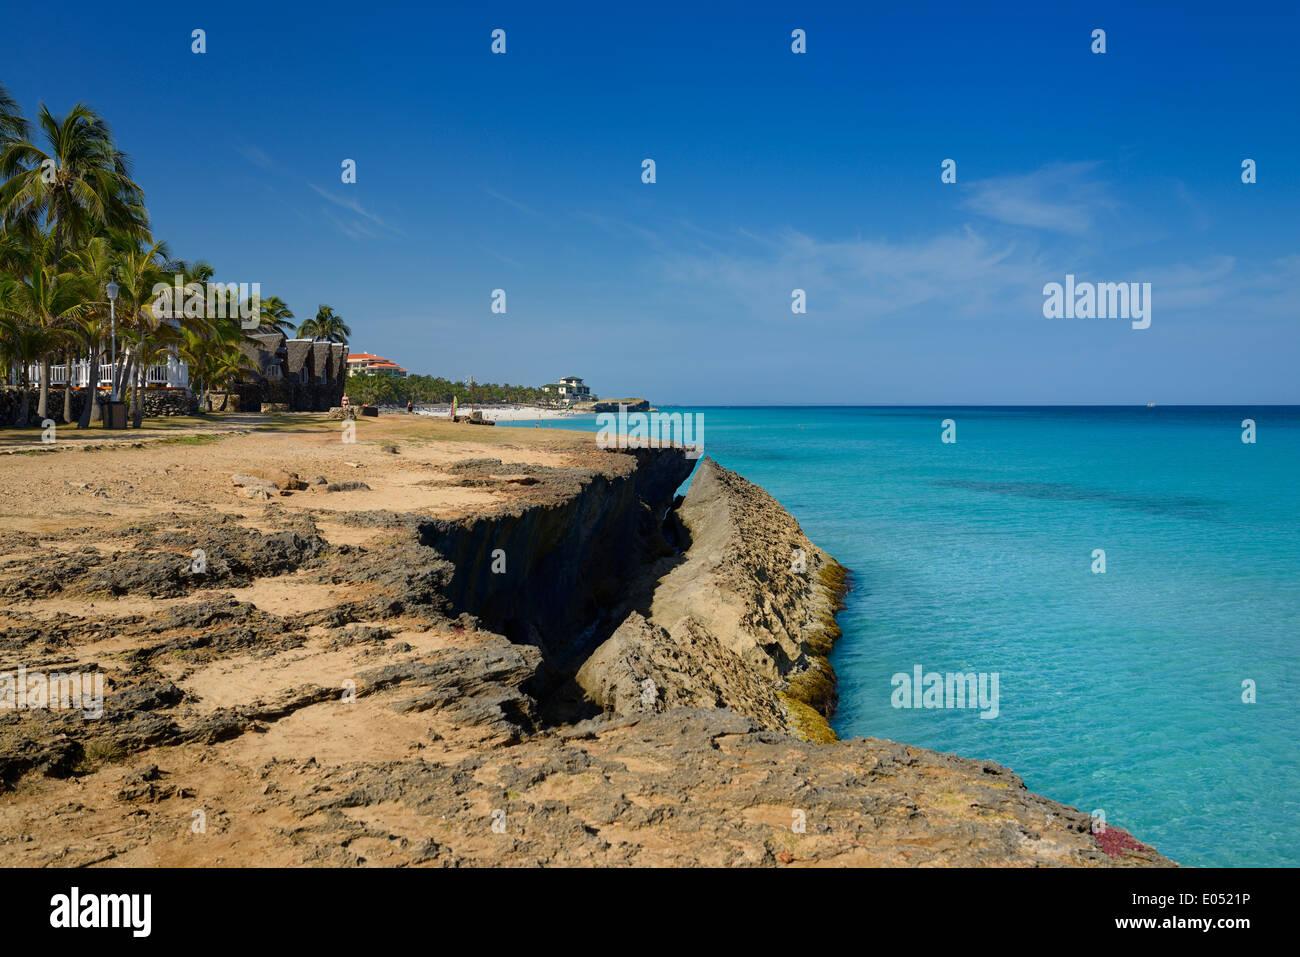 Lava Rock Ufer am Varadero Cuba Resort mit türkisblauem Meer und den weißen Sandstrand Stockbild